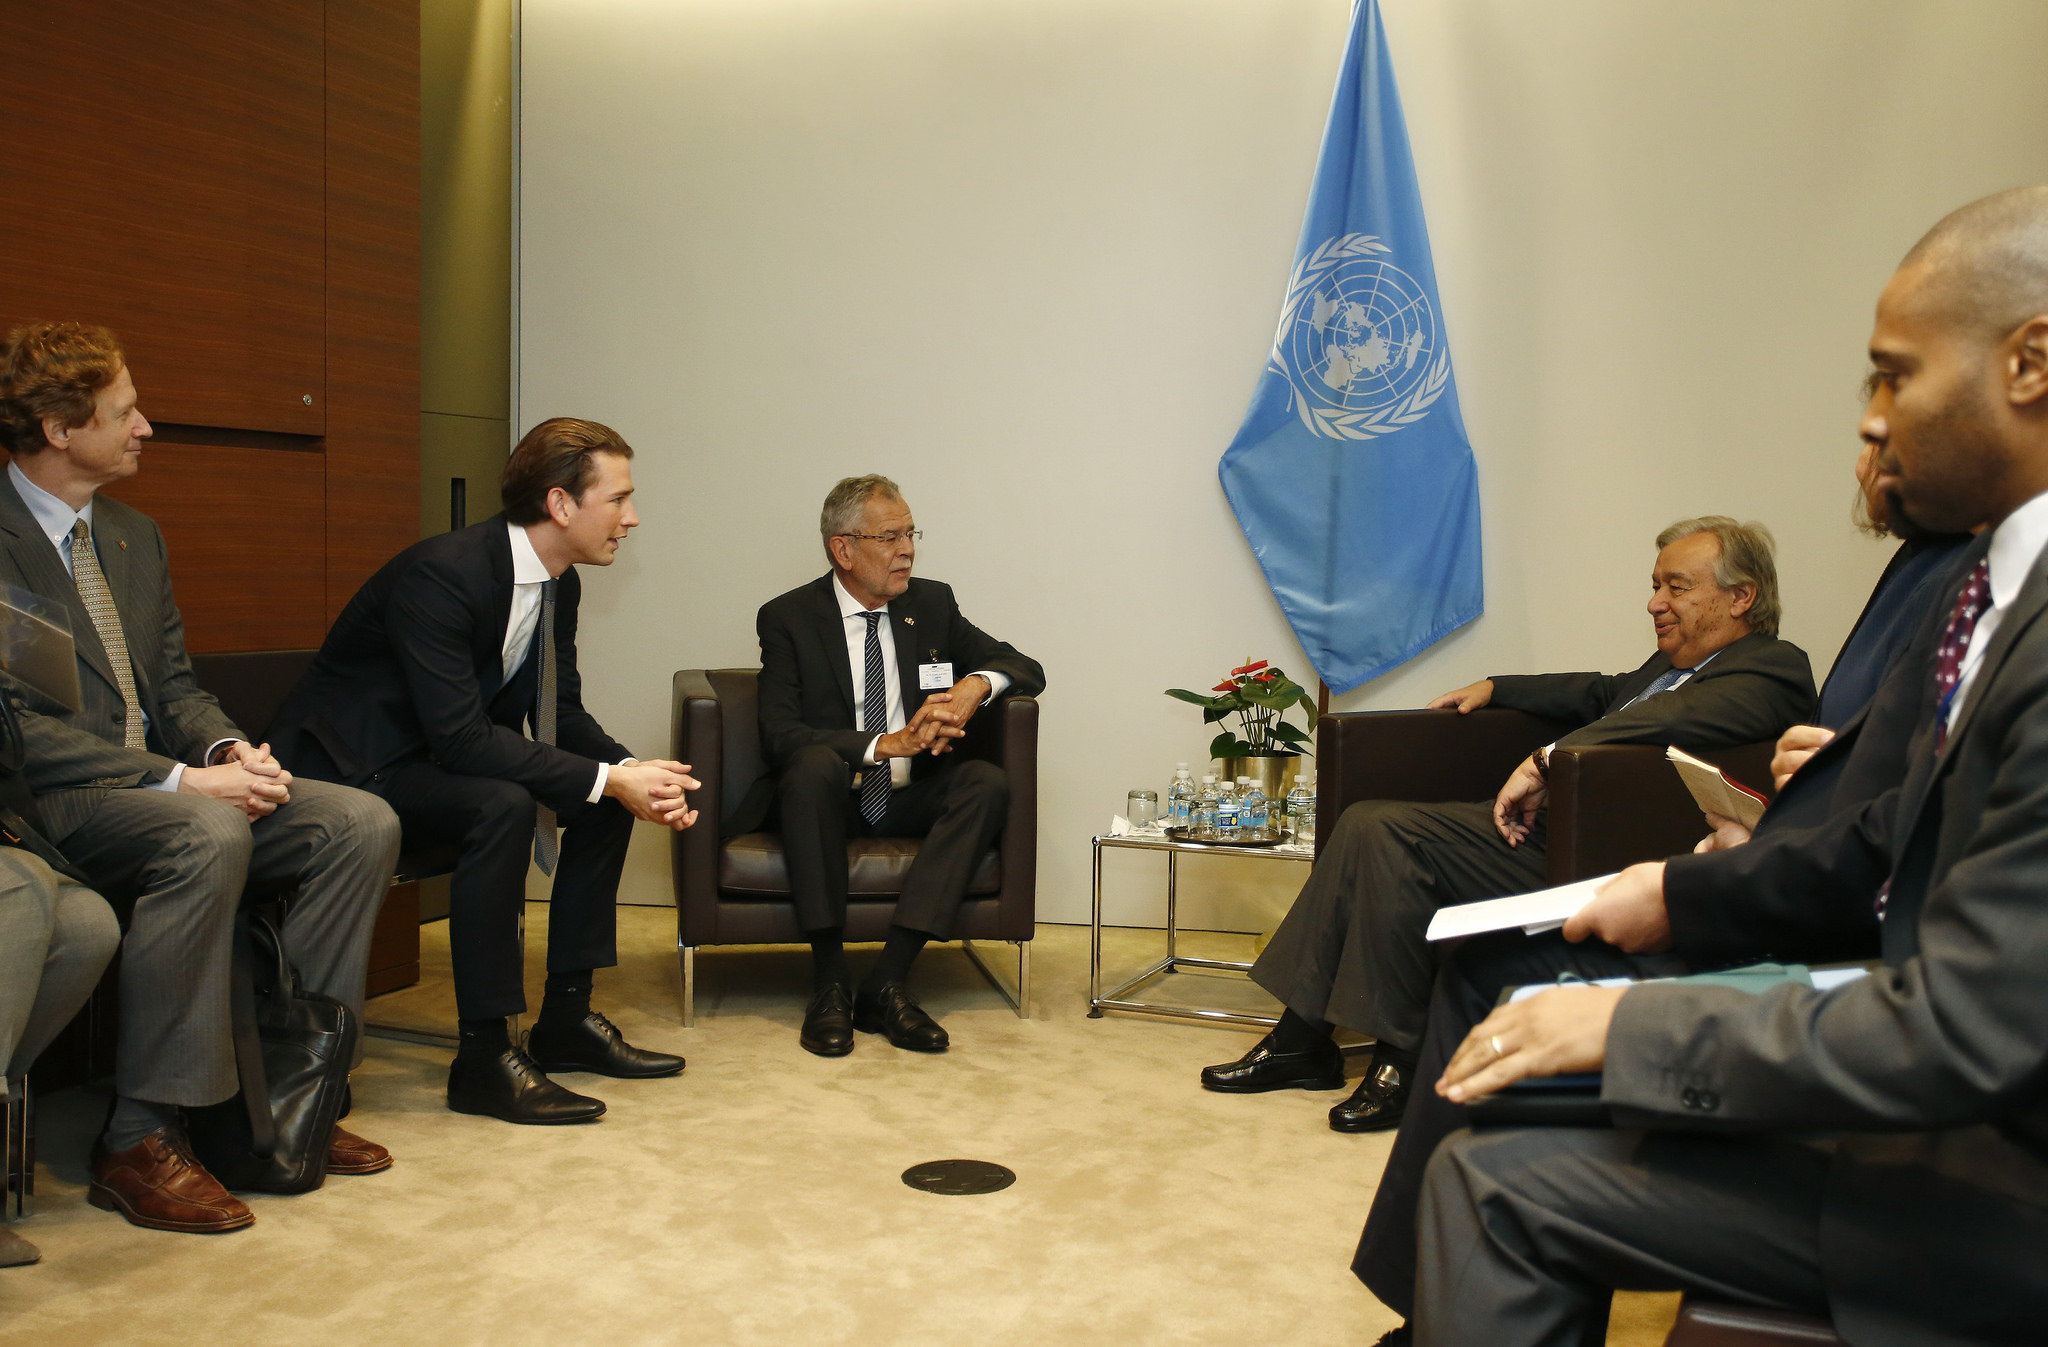 President Alexander Van der Bellen and Foreign Minister Sebastian Kurz meet with UN Secretary-General Antonio Guterres in New York, September 20, 2017, Photo: Dragan Tatic